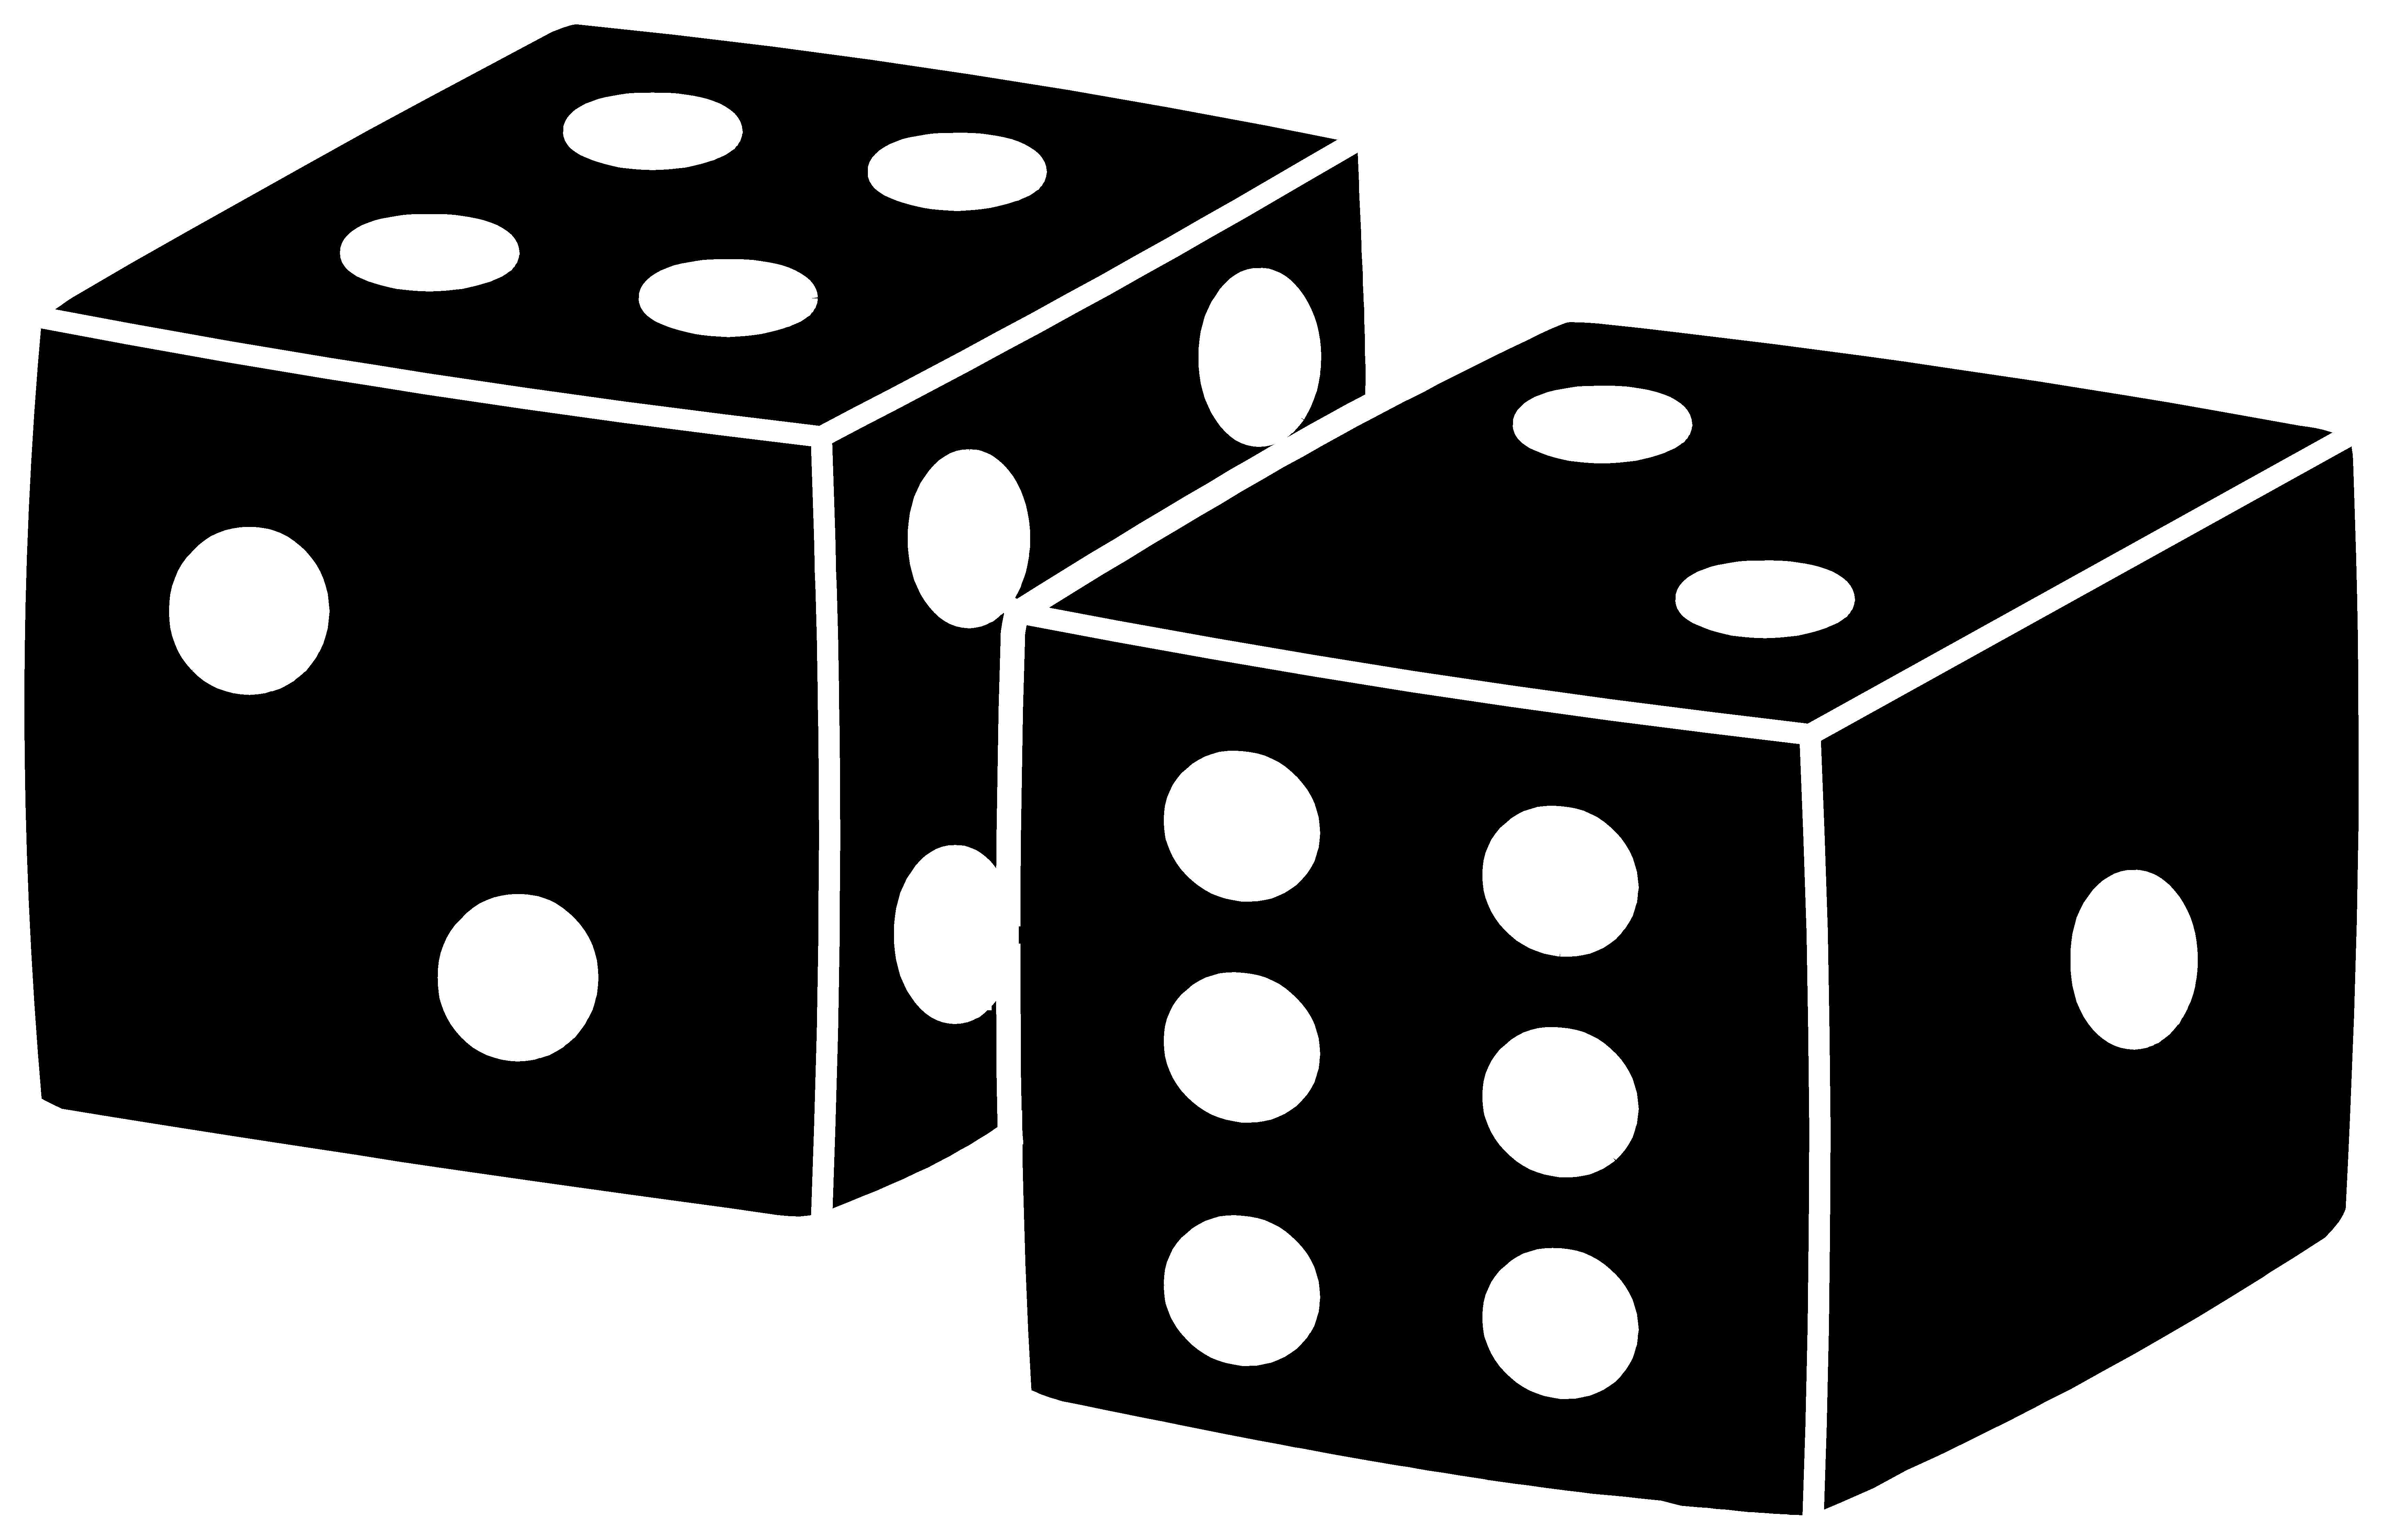 image transparent stock Black Playing Dice Design